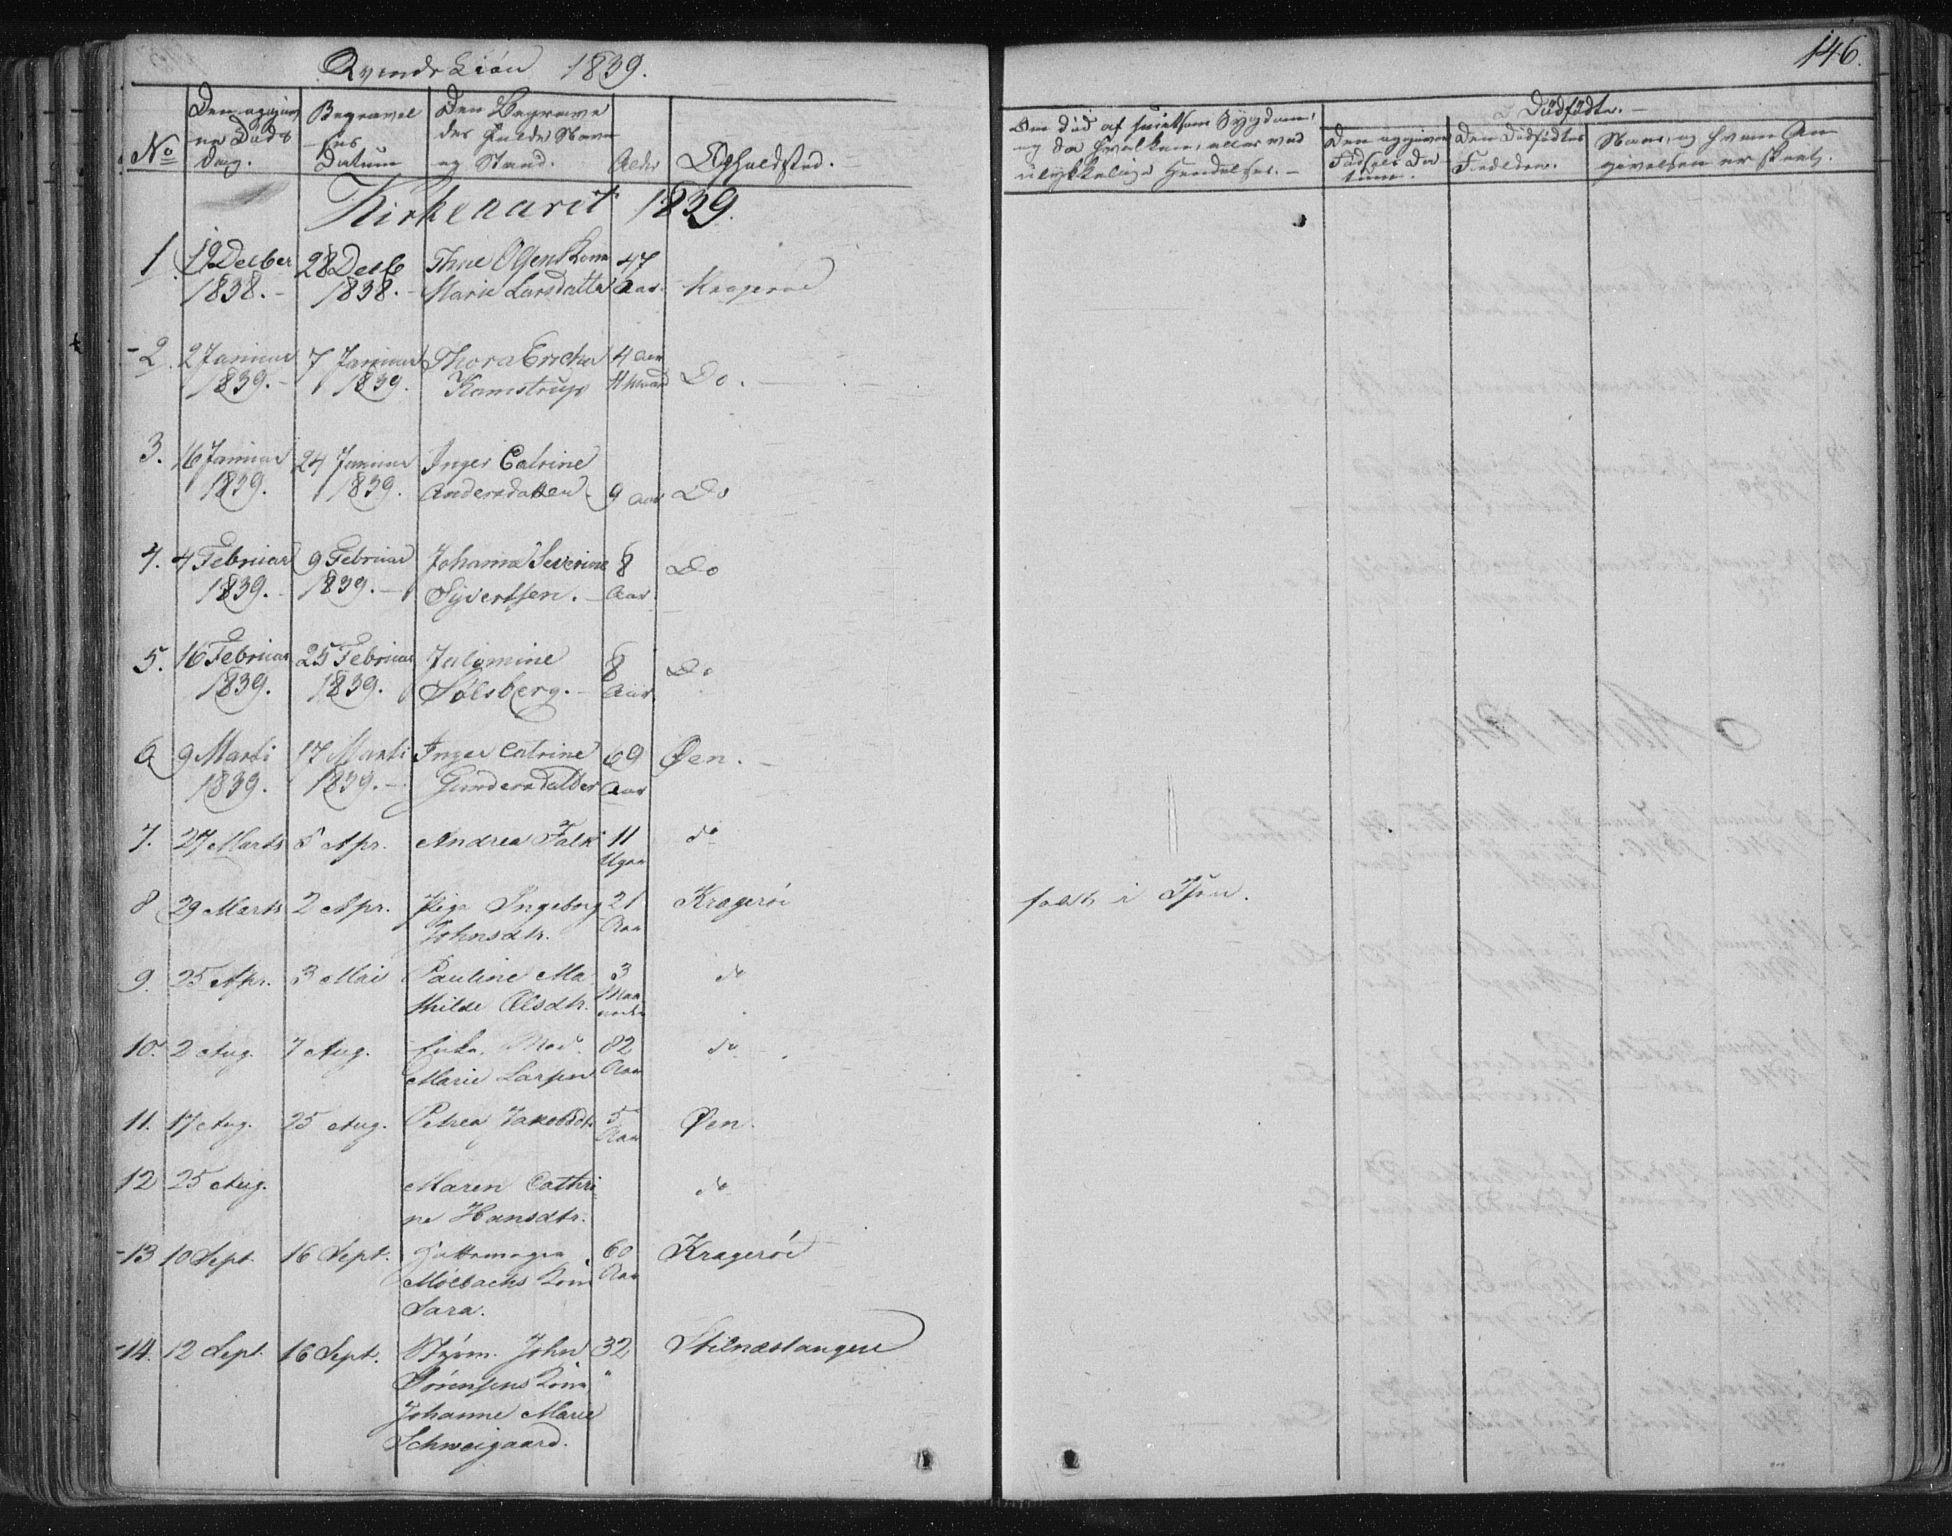 SAKO, Kragerø kirkebøker, F/Fa/L0005: Ministerialbok nr. 5, 1832-1847, s. 146